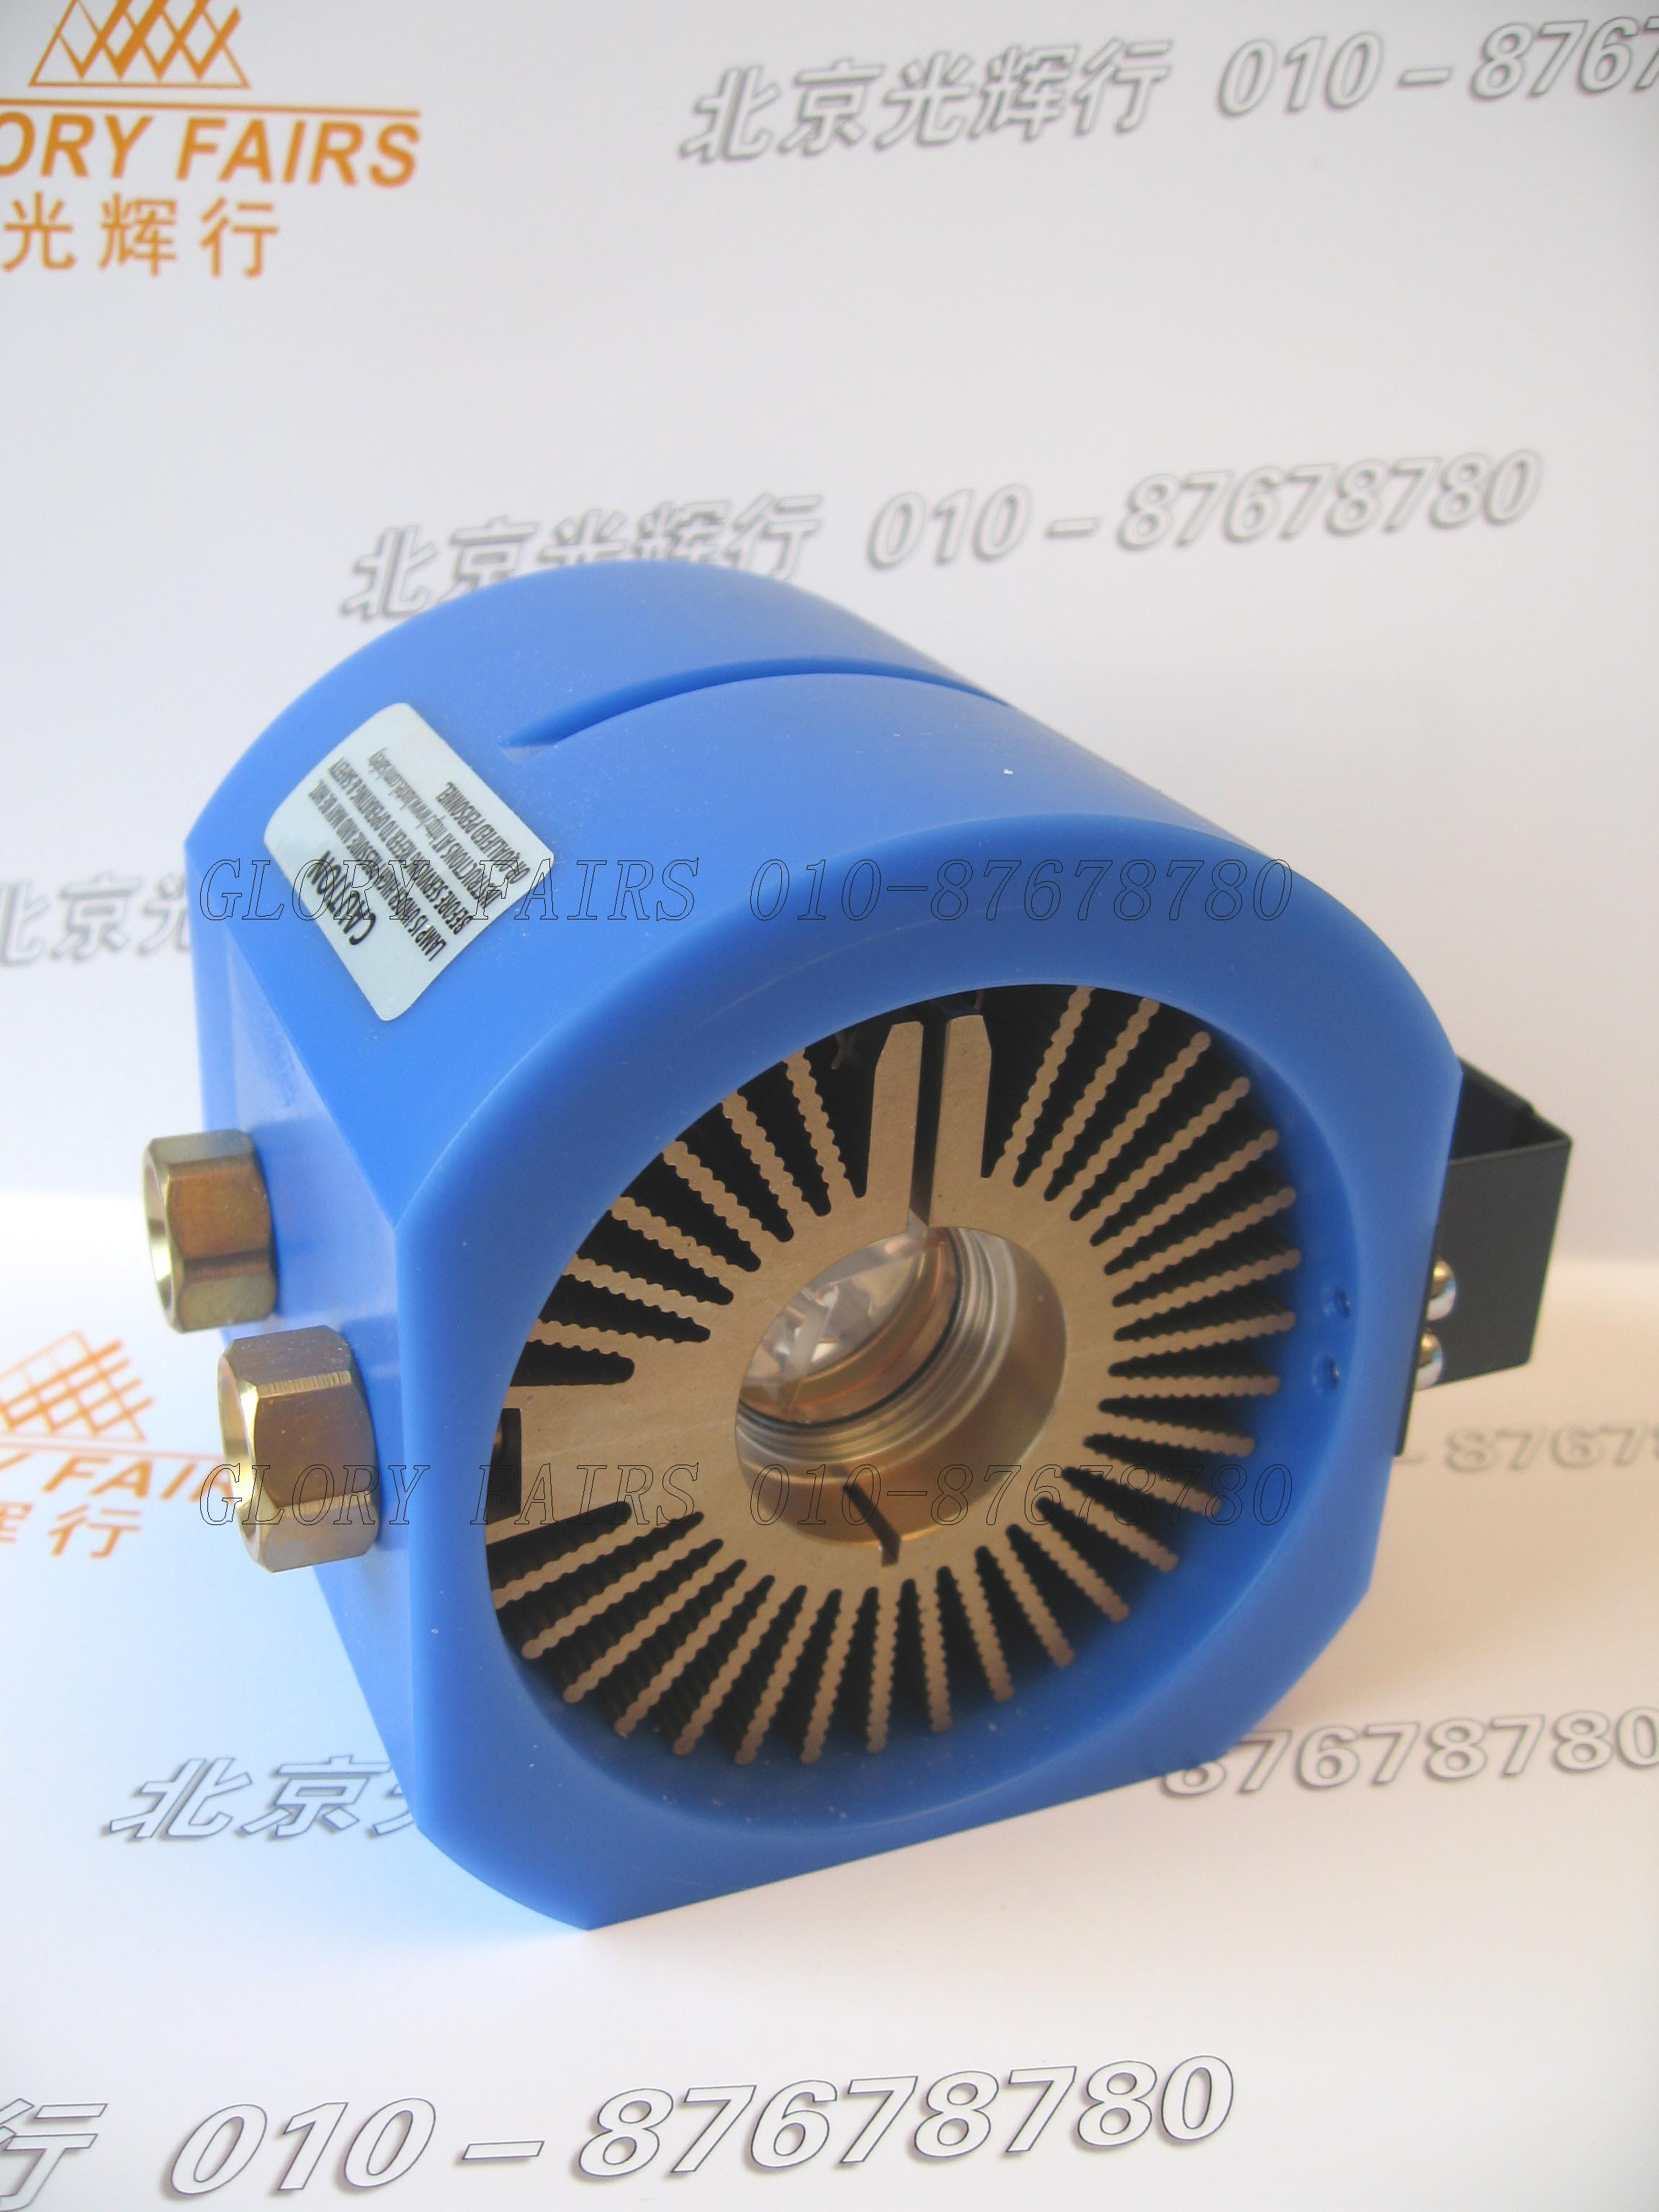 300w Replacement Xenon Lamp Module